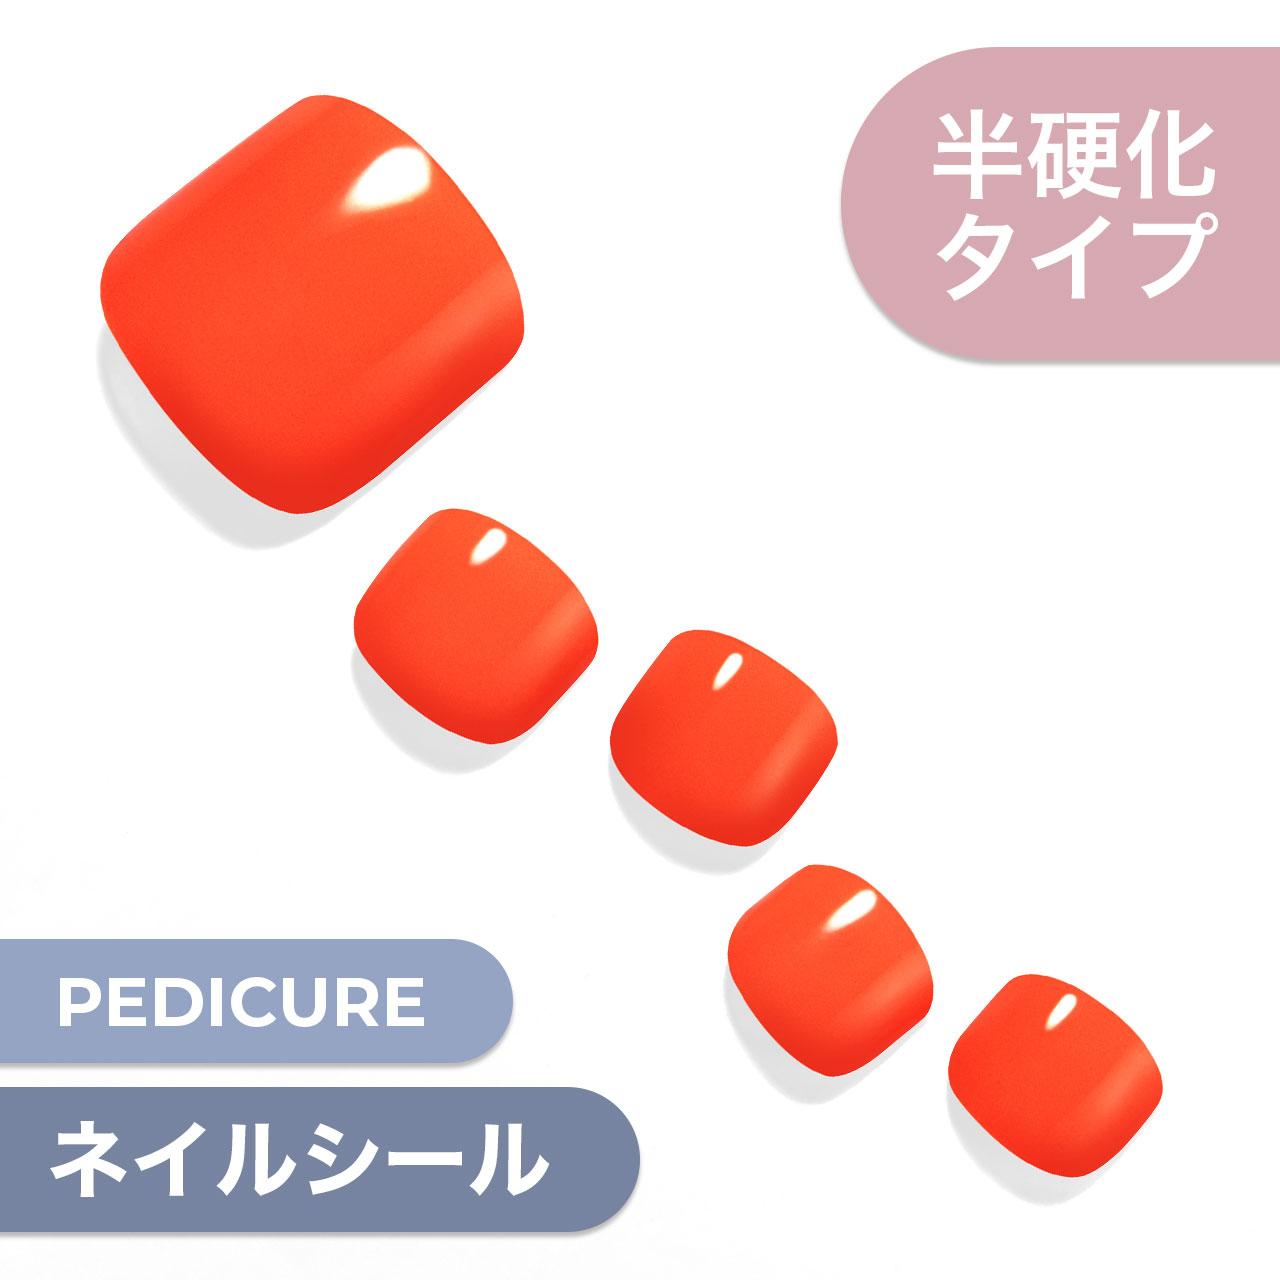 【Juicy Raspberry Pedi】ダッシングディバグレーズ ペディ